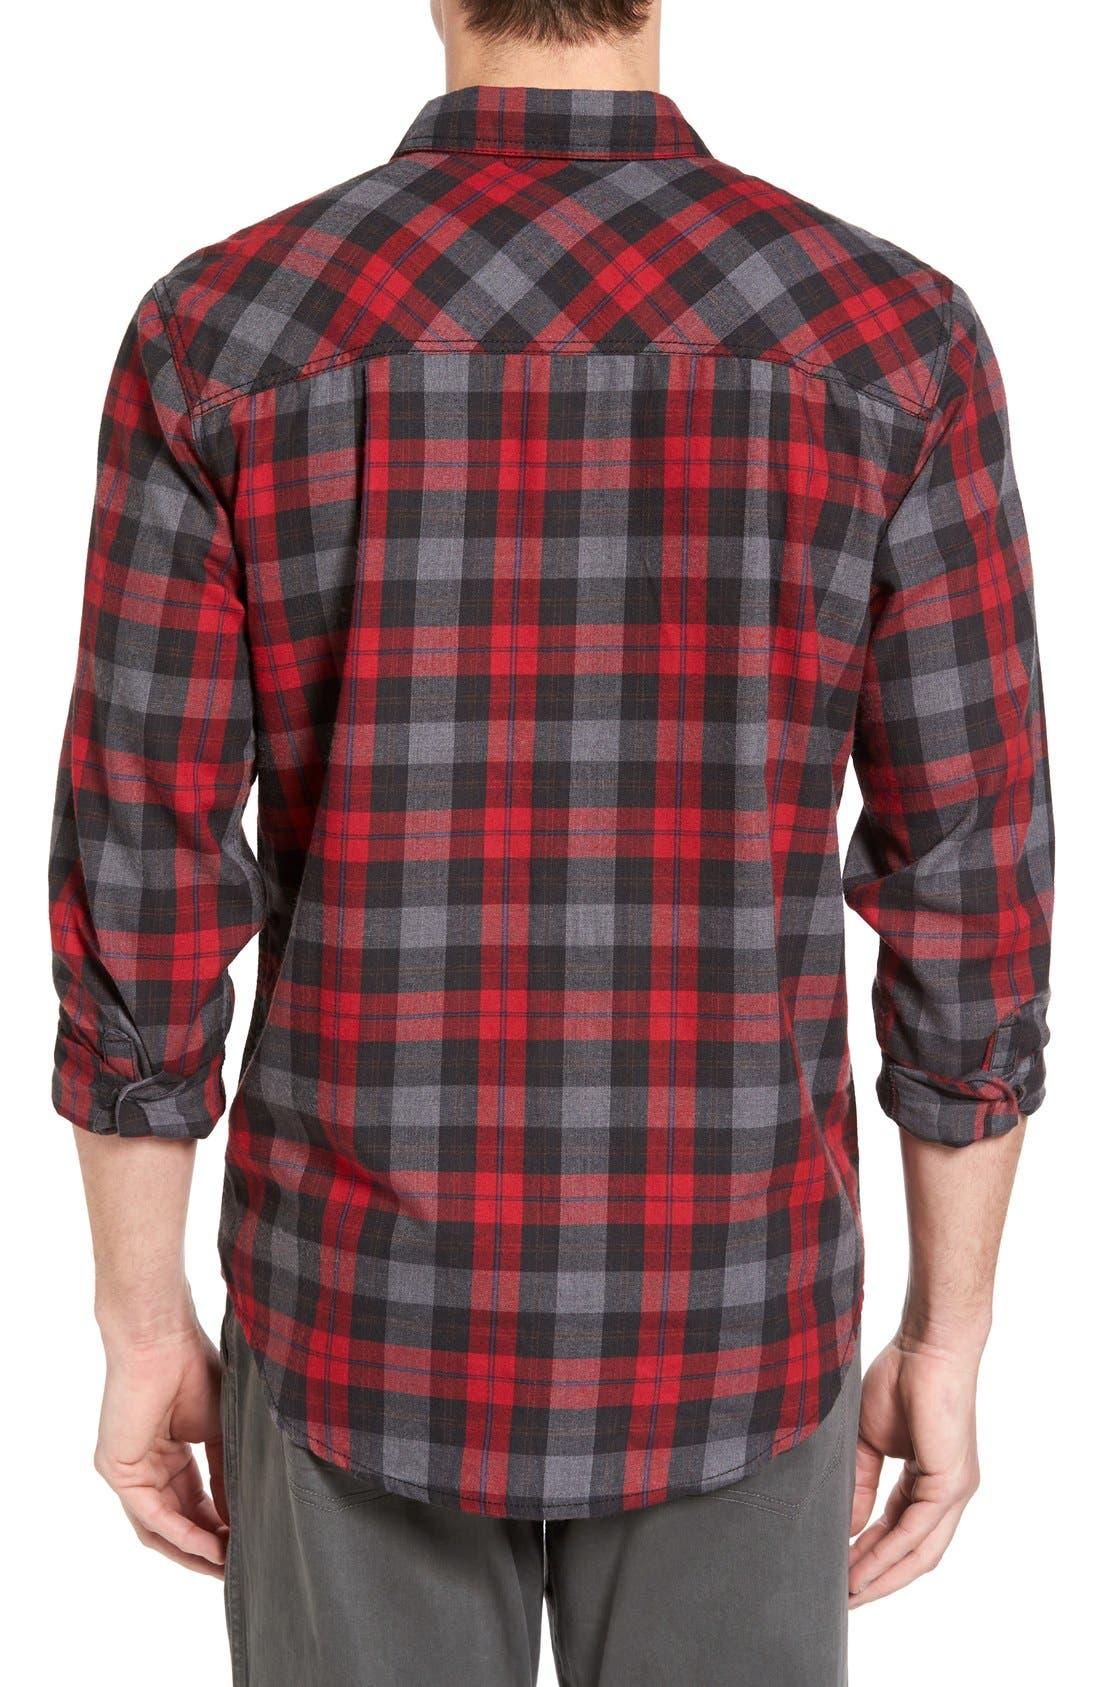 Burner Regular Fit Plaid Flannel Shirt,                             Alternate thumbnail 2, color,                             Fiery Red